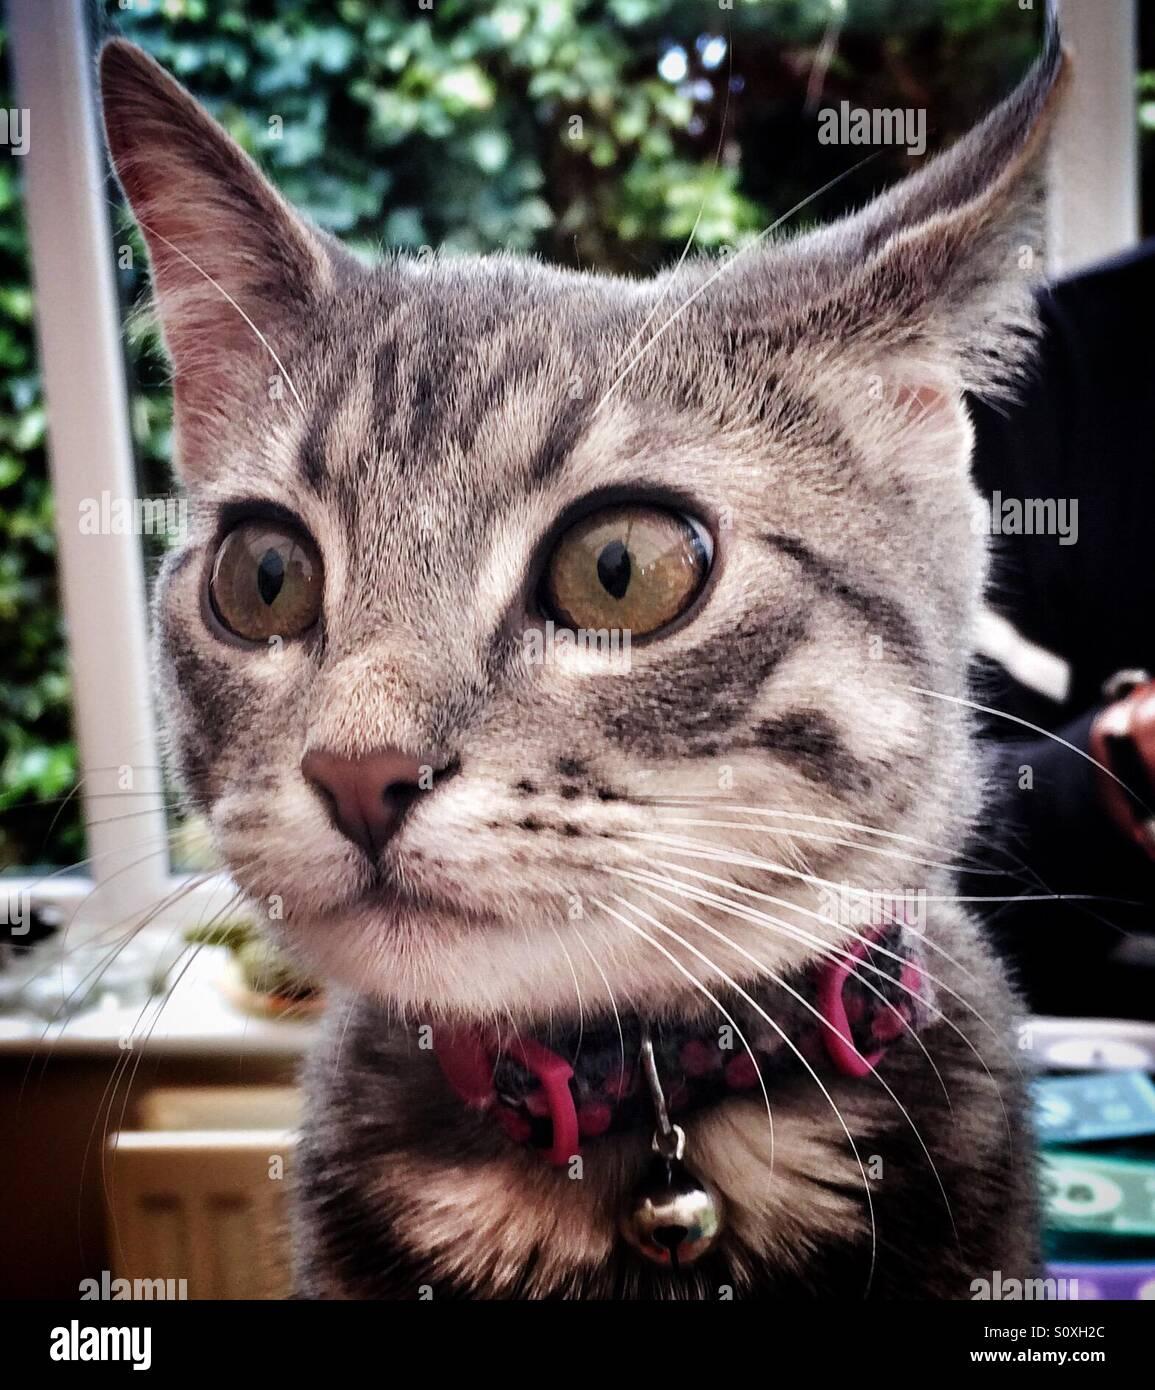 A close up of a beautiful cat - Stock Image